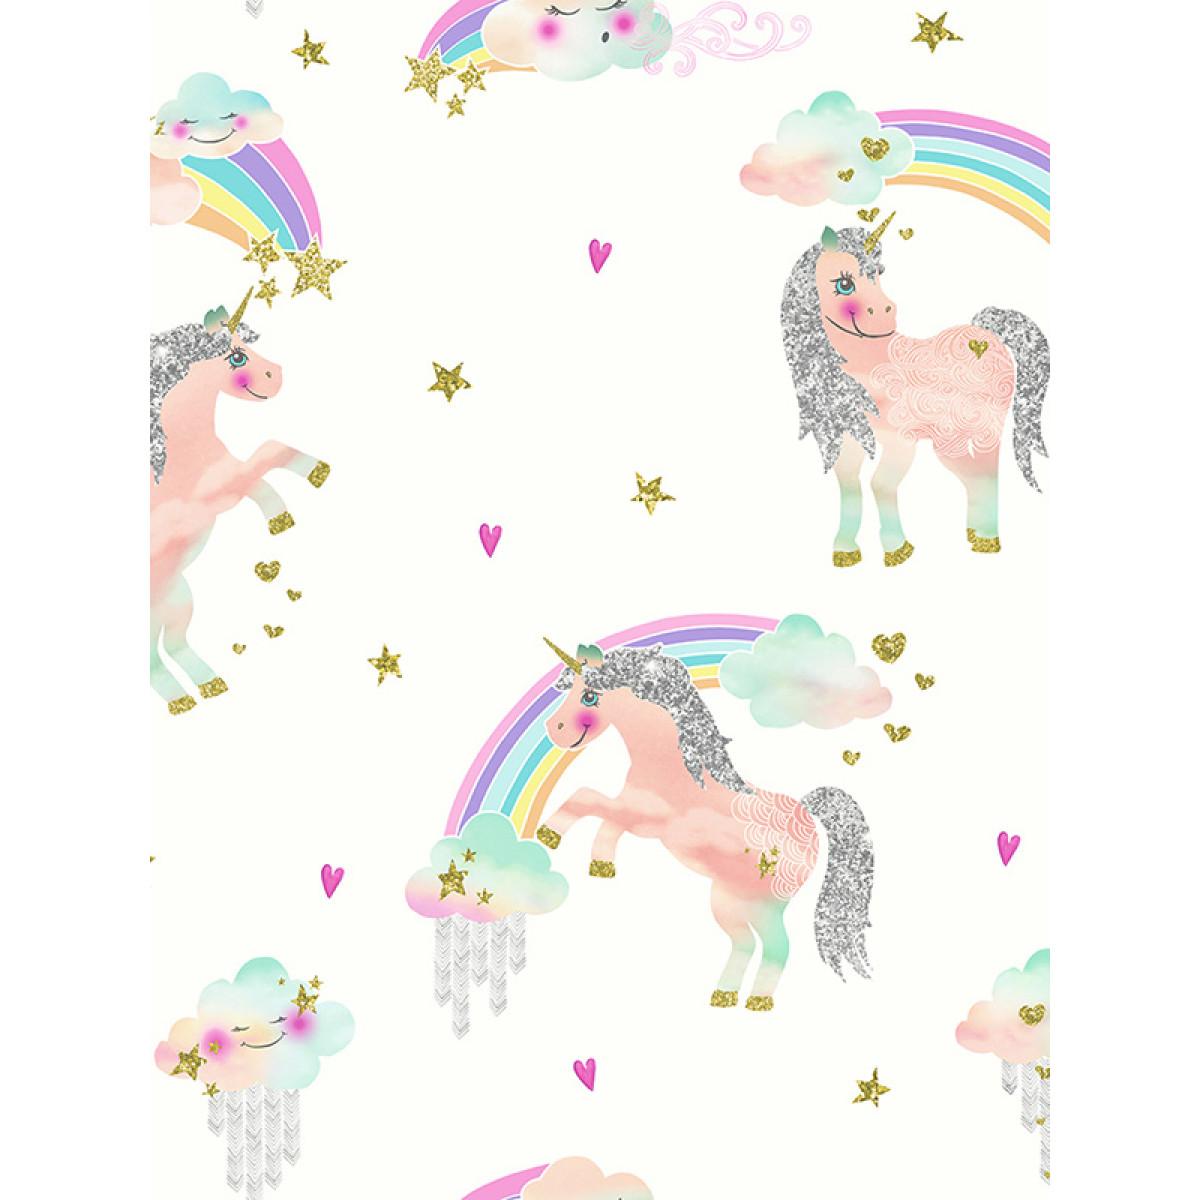 Rainbow Unicorn Glitter Wallpaper White Arthouse 696109 Bedroom